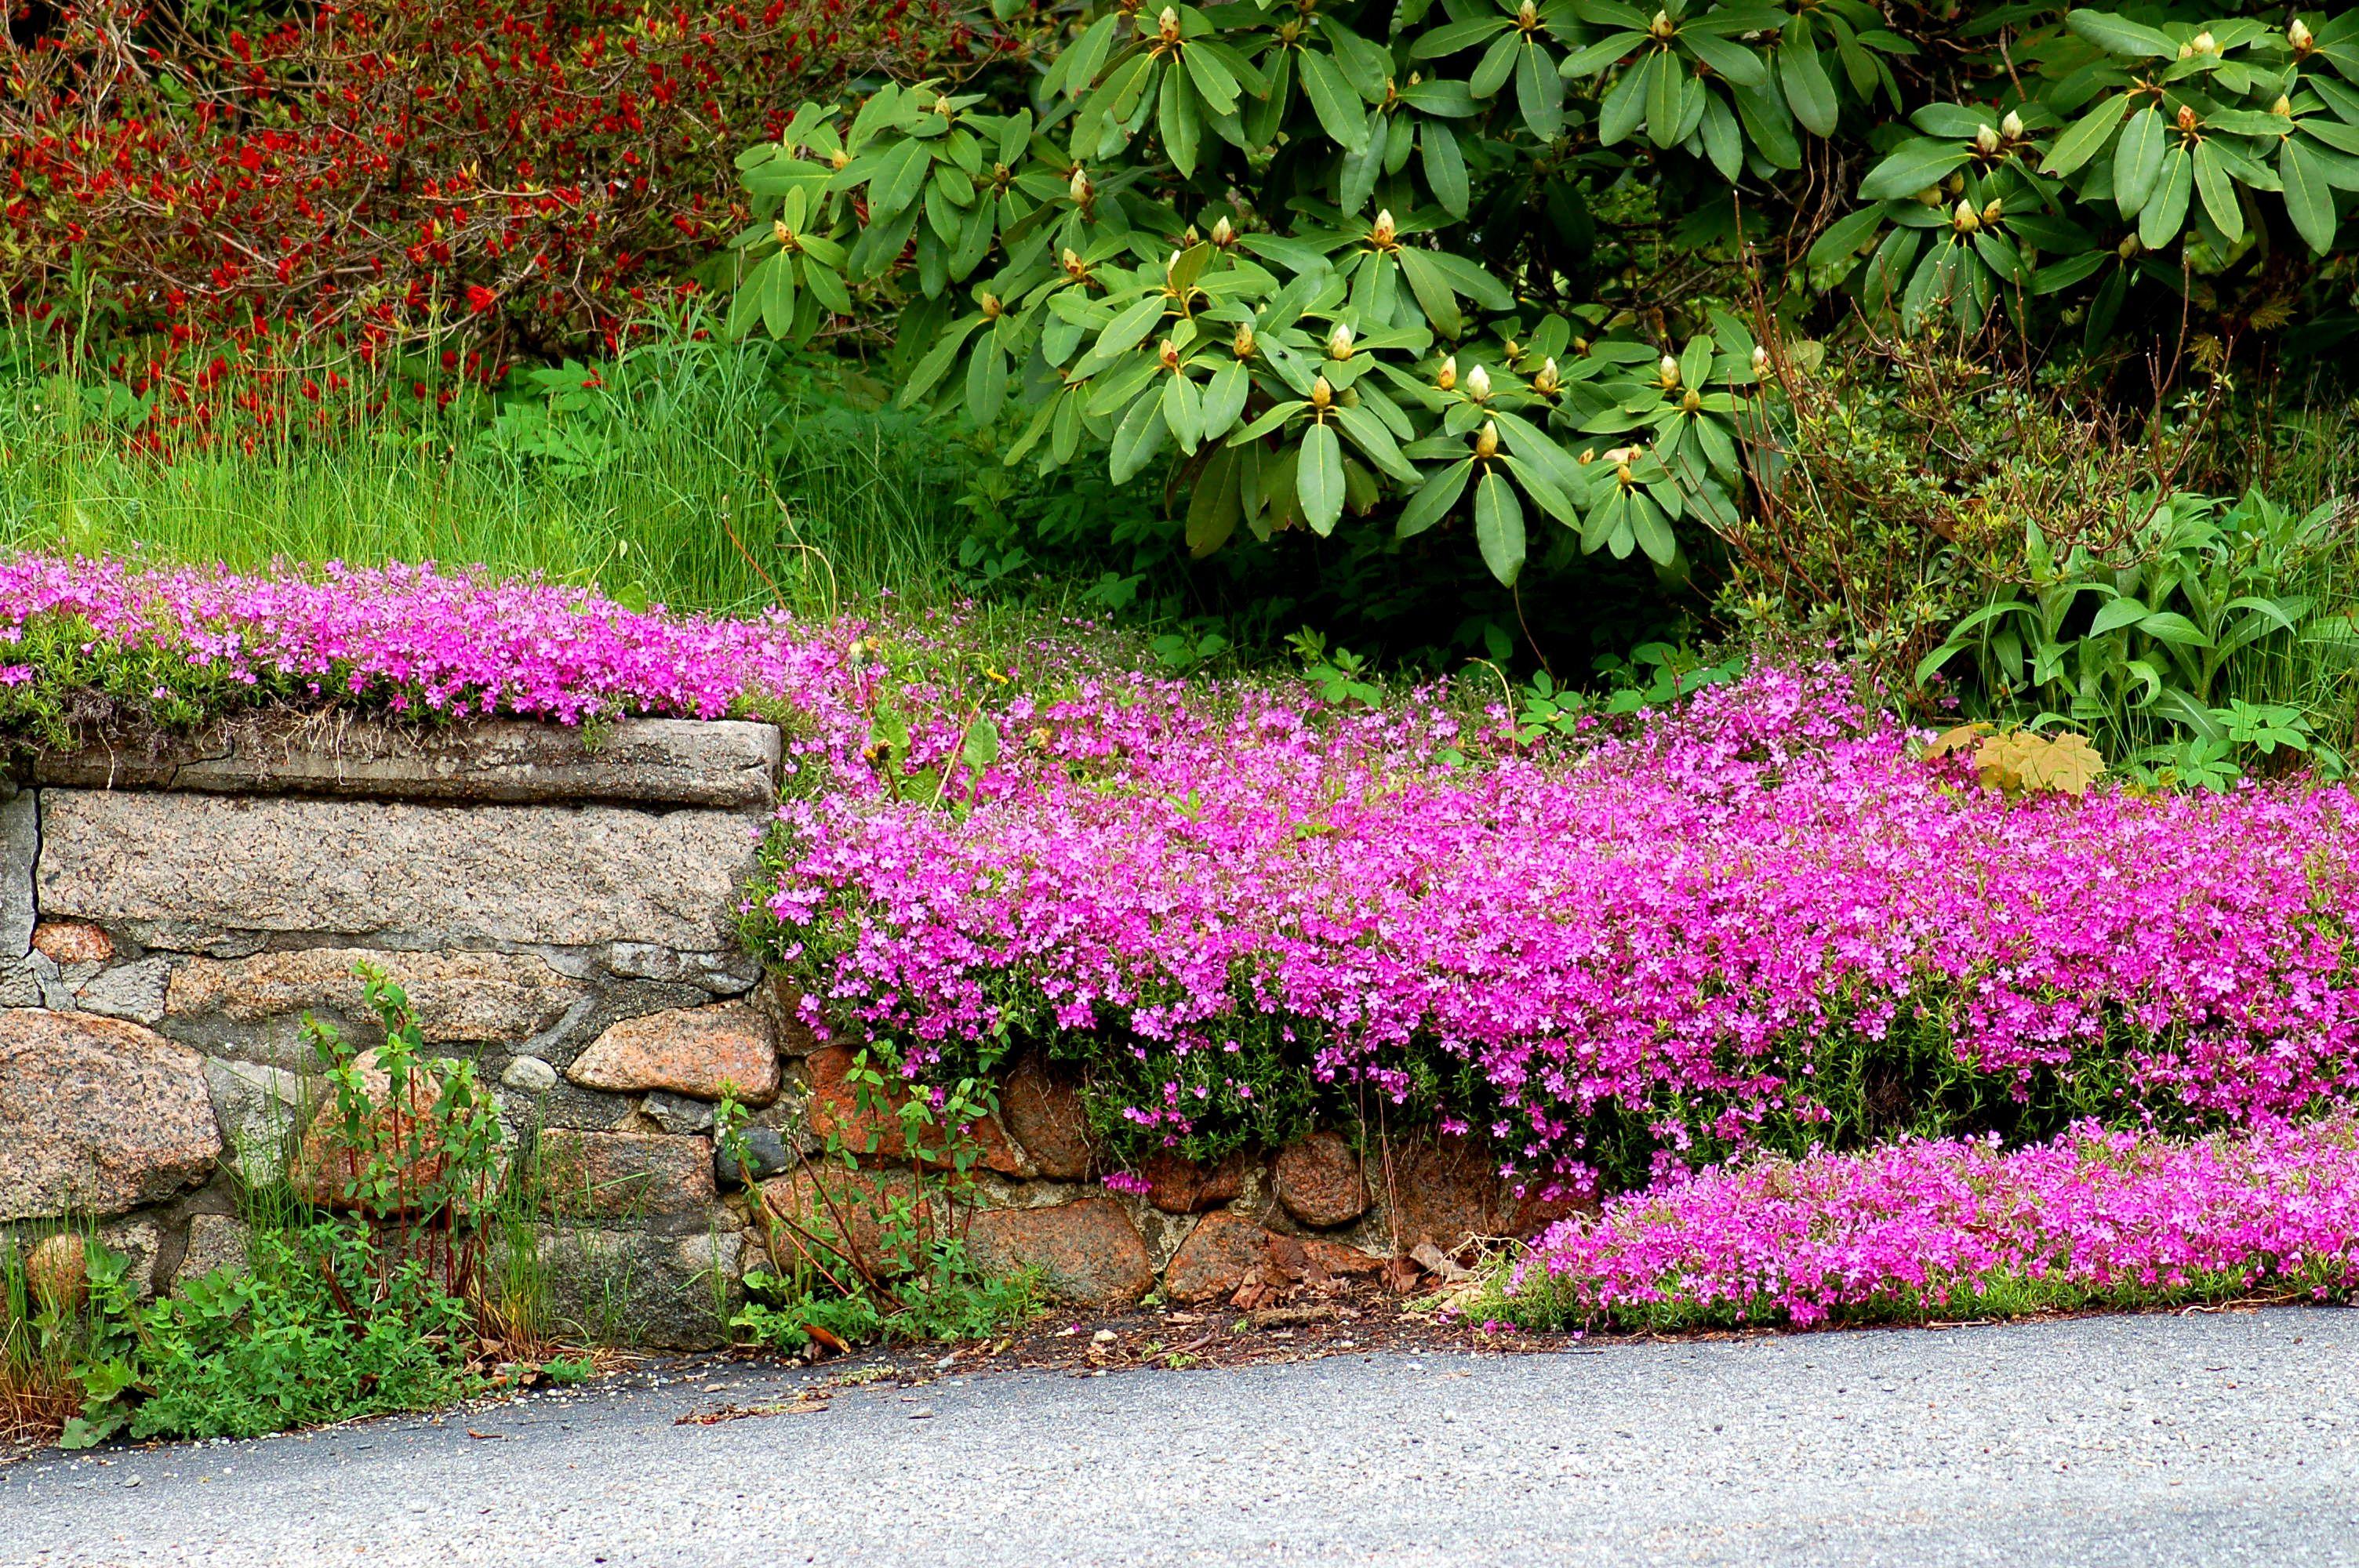 Purple creeping phlox growing near a stone wall.